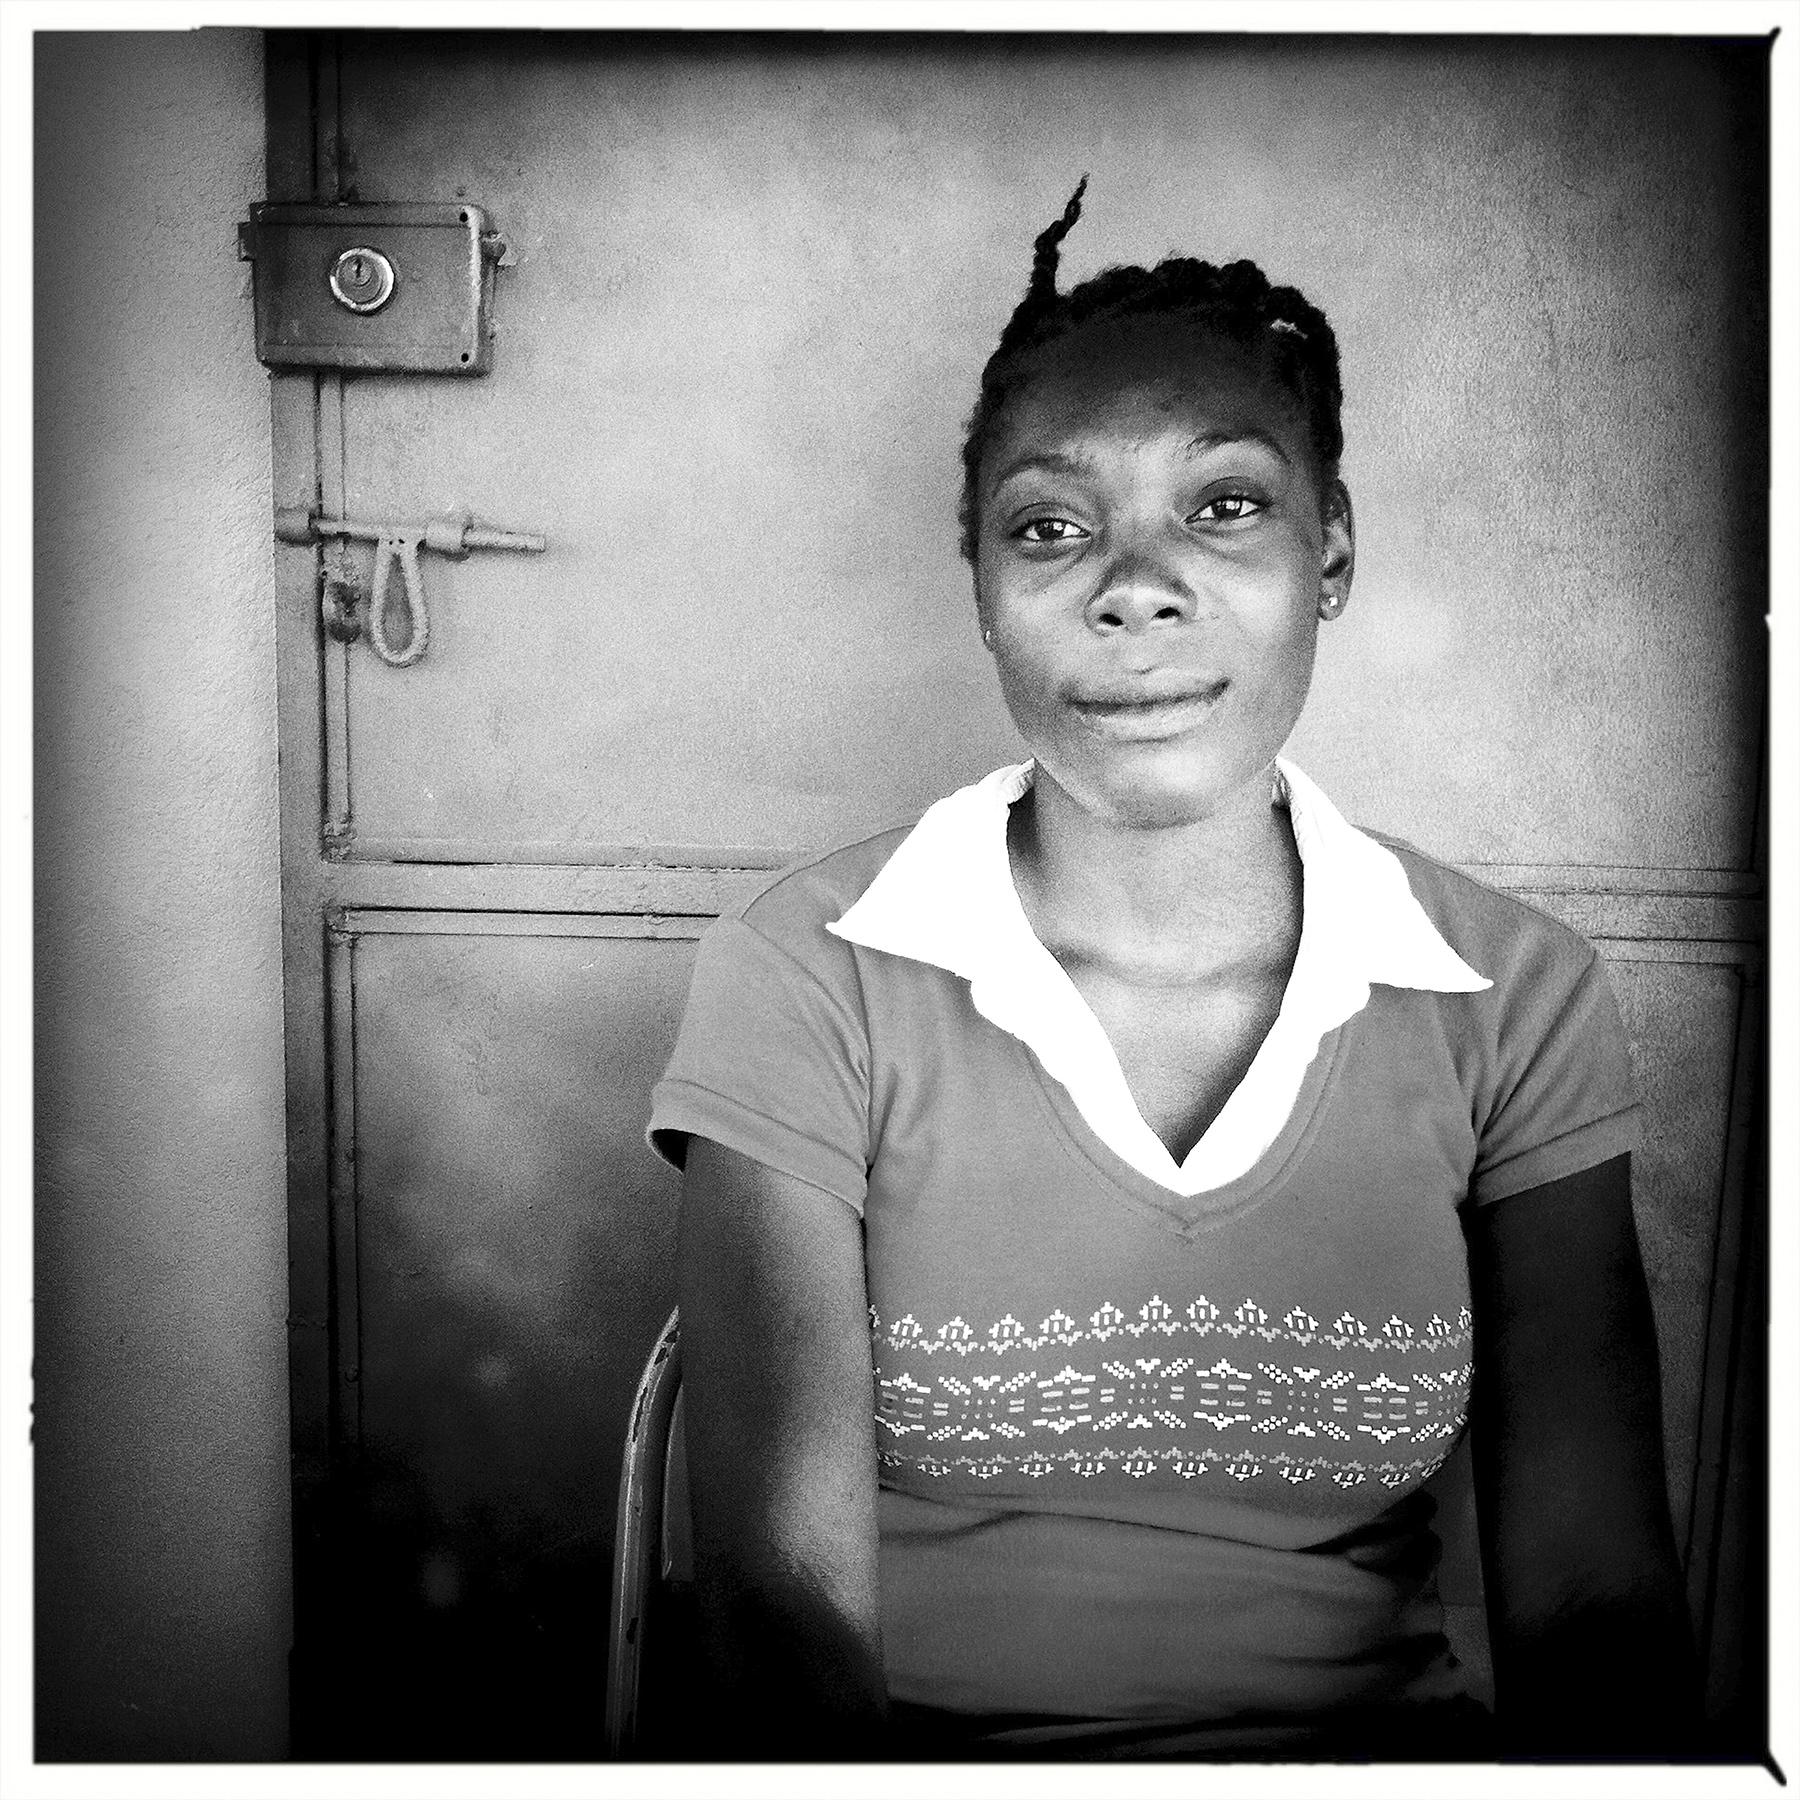 Cheryl_CleggFaces_of_the_Rasin_Foundation_Haiti_6.jpg